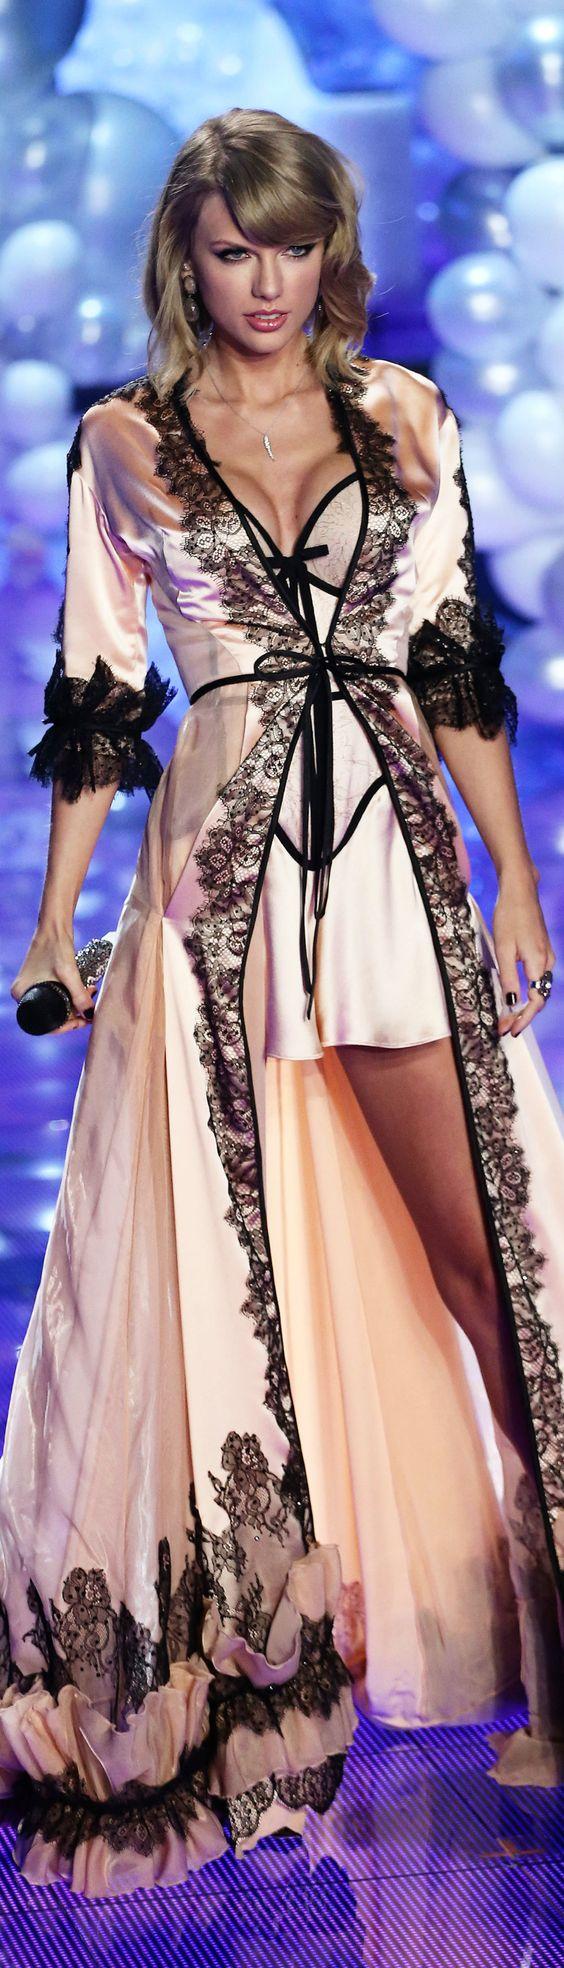 TD ❤️ Victoria Secret Fashion Show 2014- Taylor Swift in High Fashion Lingerie